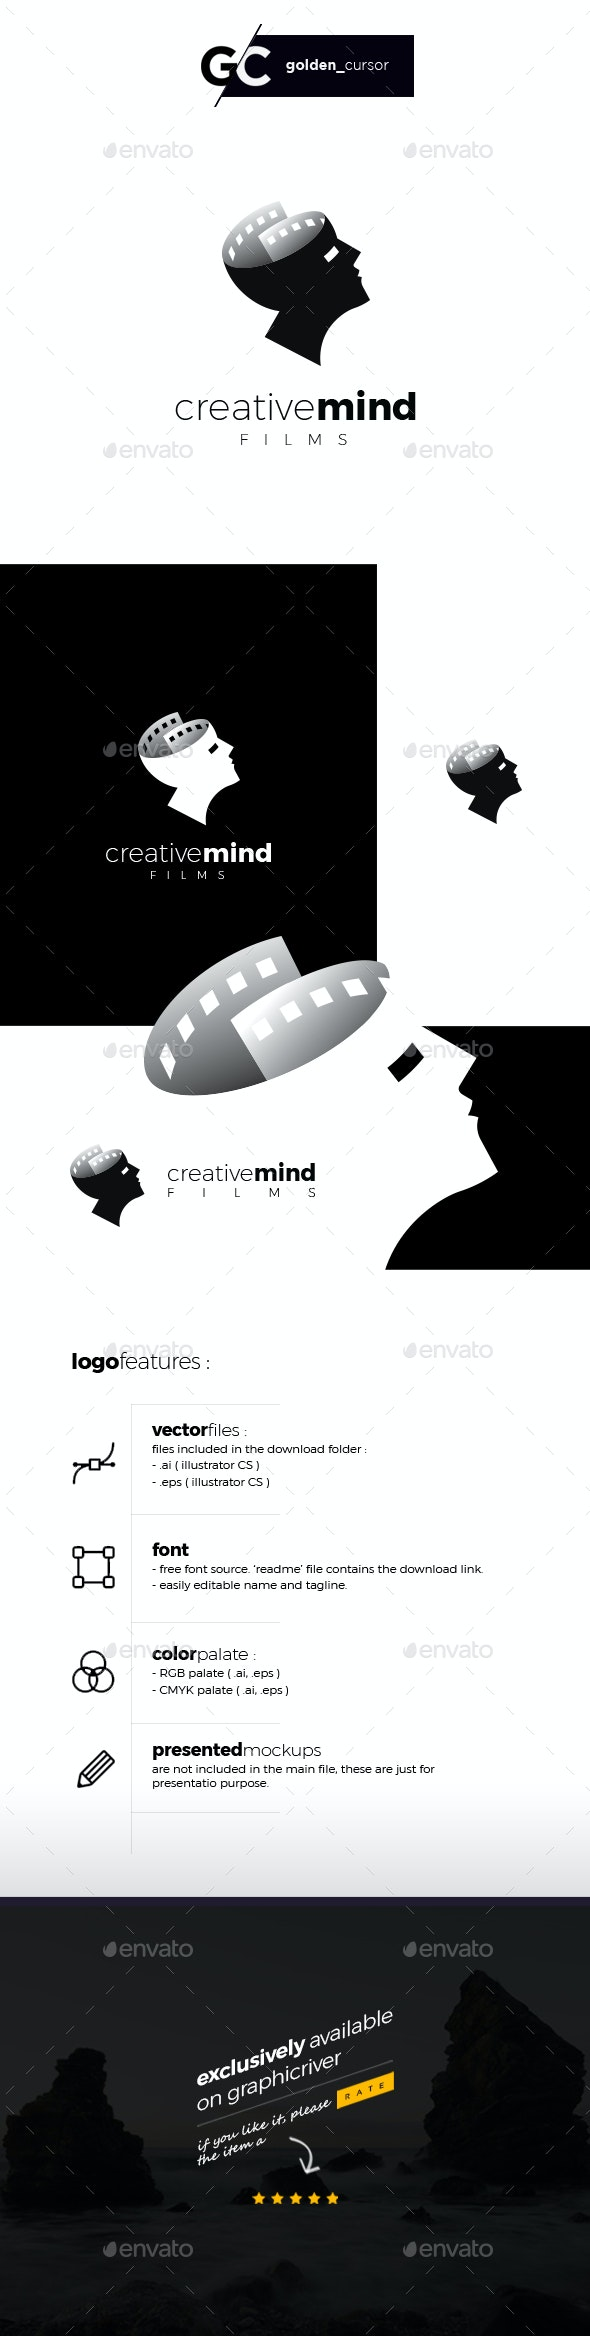 Creative mind films logo template - Company Logo Templates